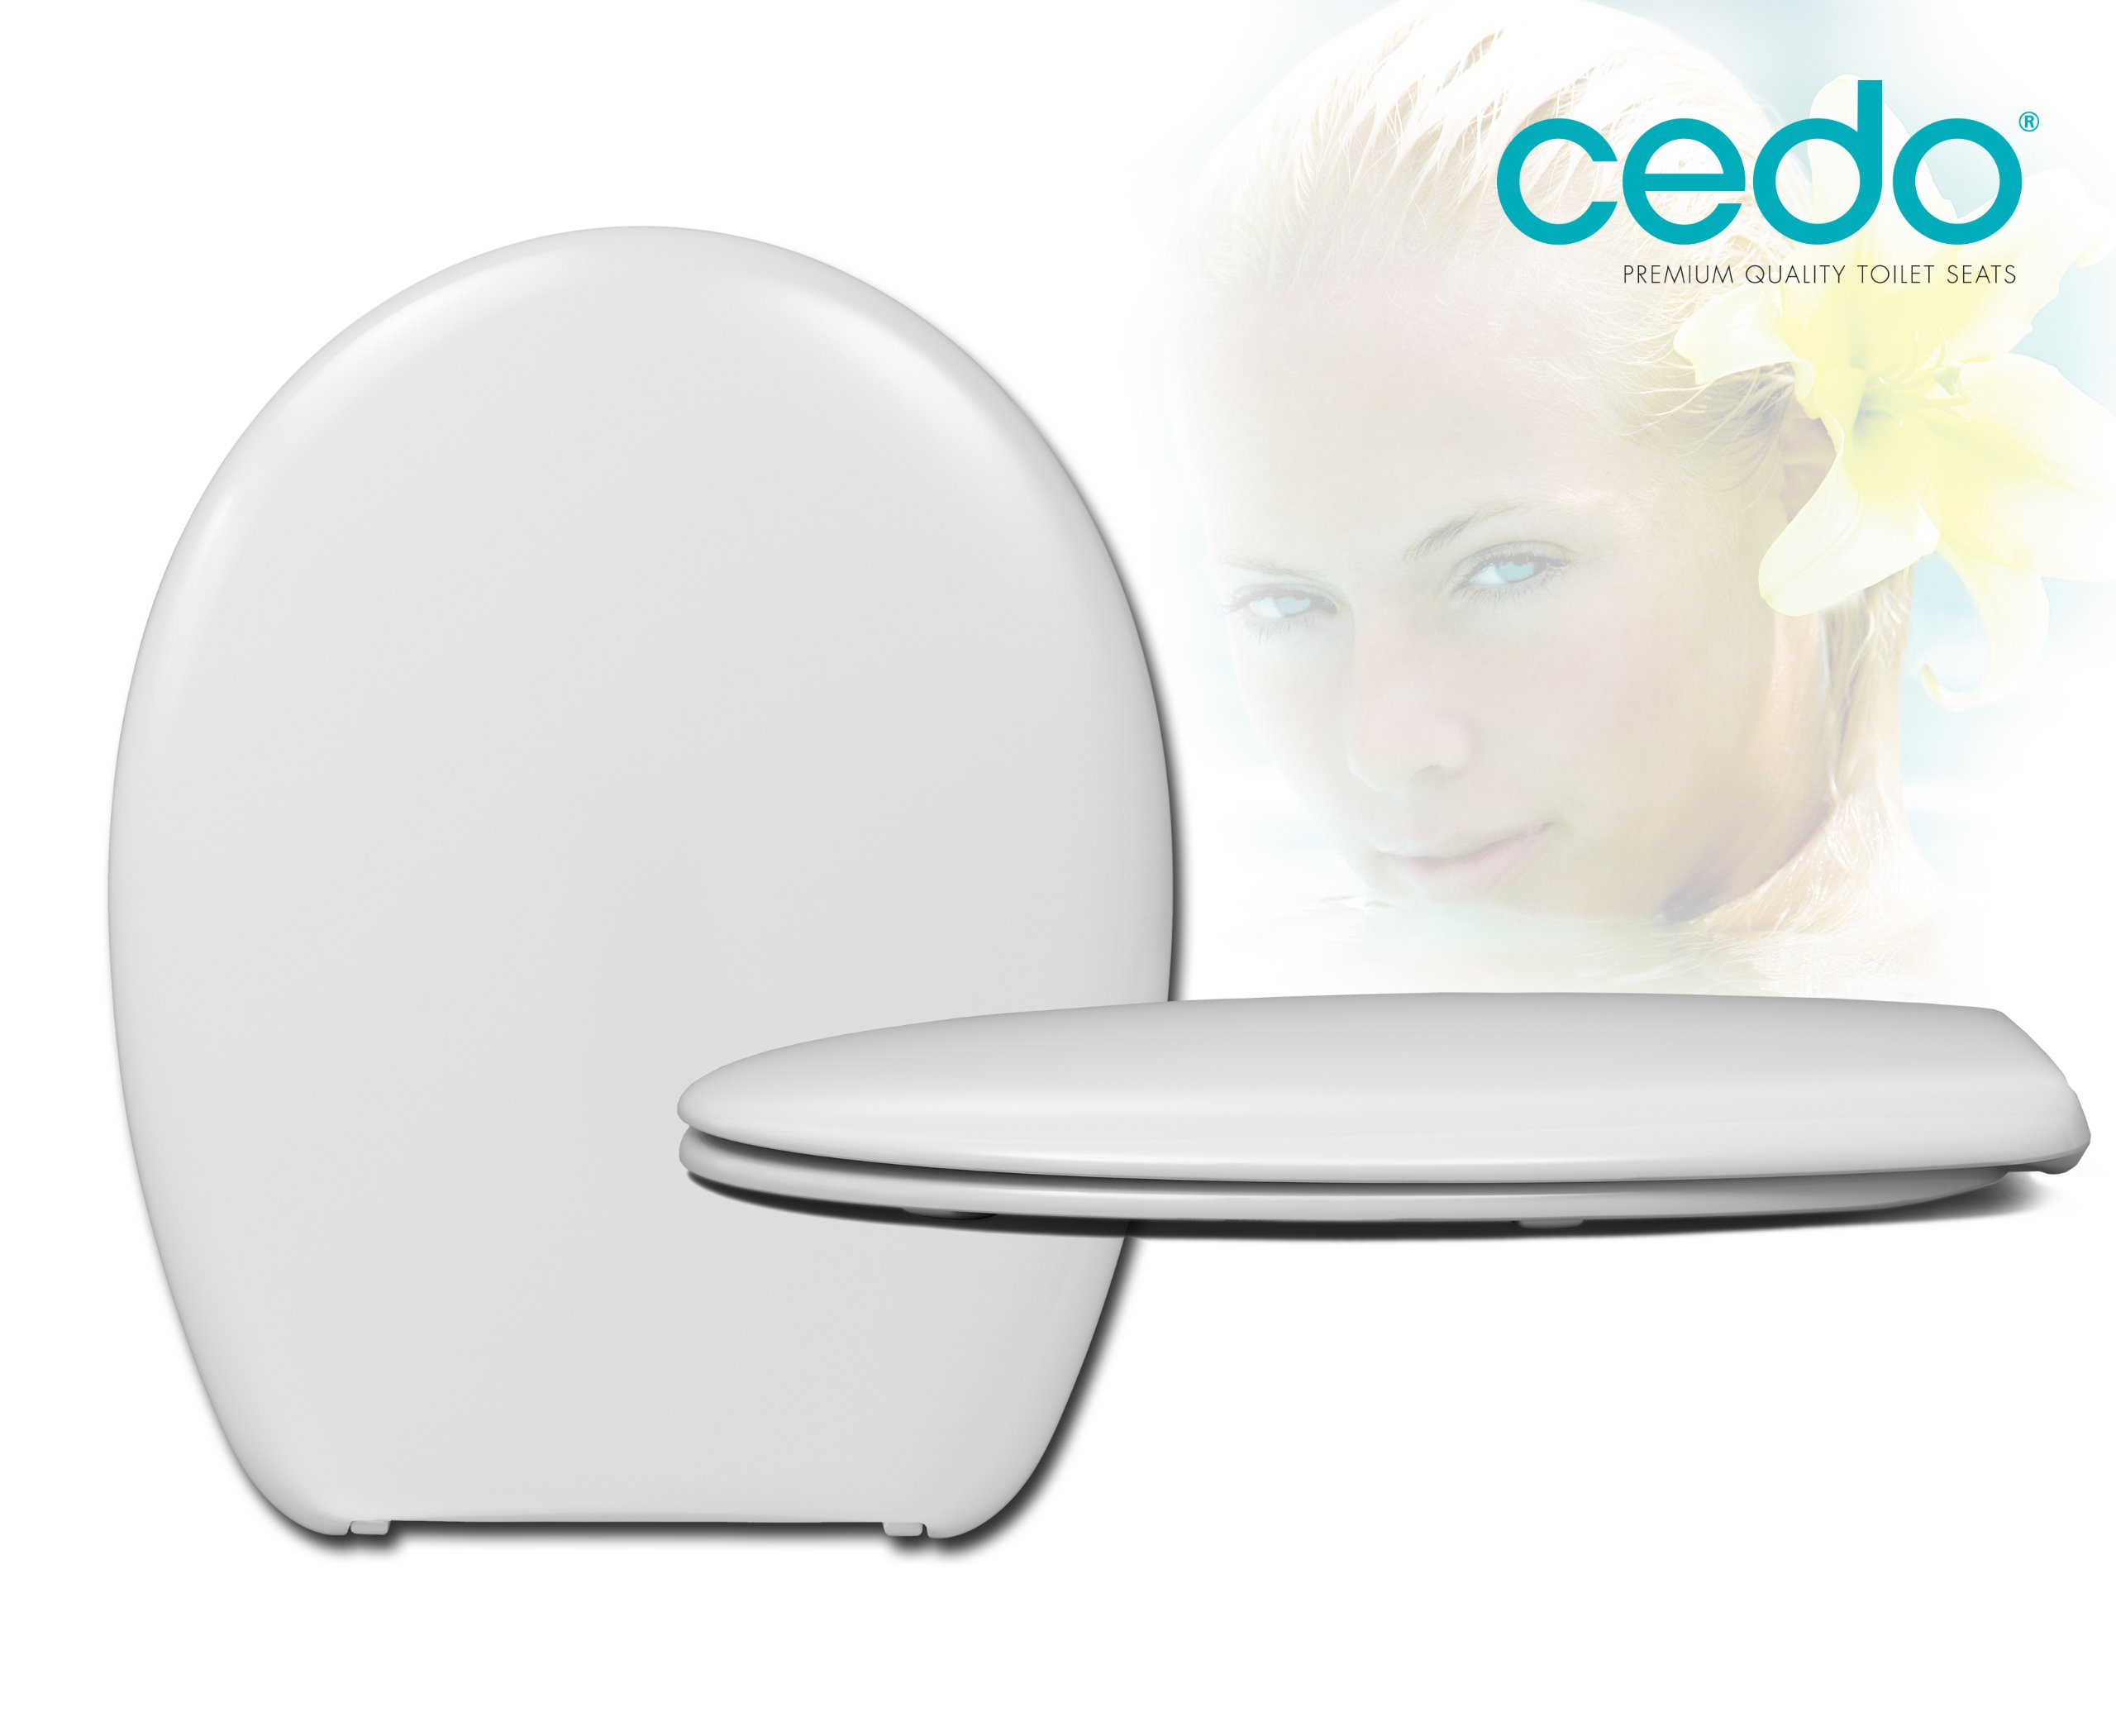 polipropileno y Soft Close Take Off Blanco Cedo 534386/asiento de inodoro universal